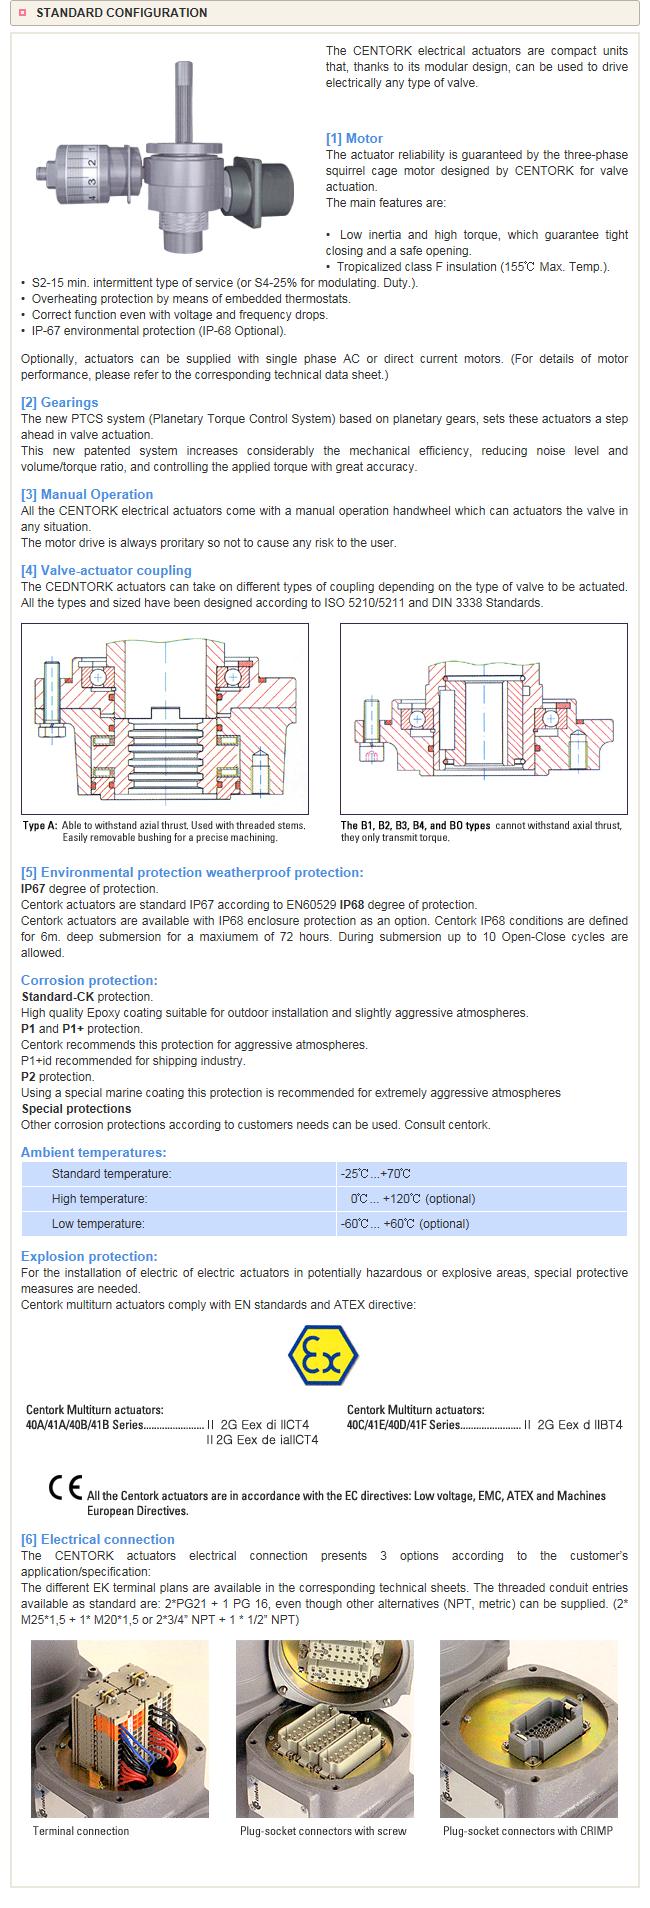 Goldline Tech Centork Electric Actuator Features